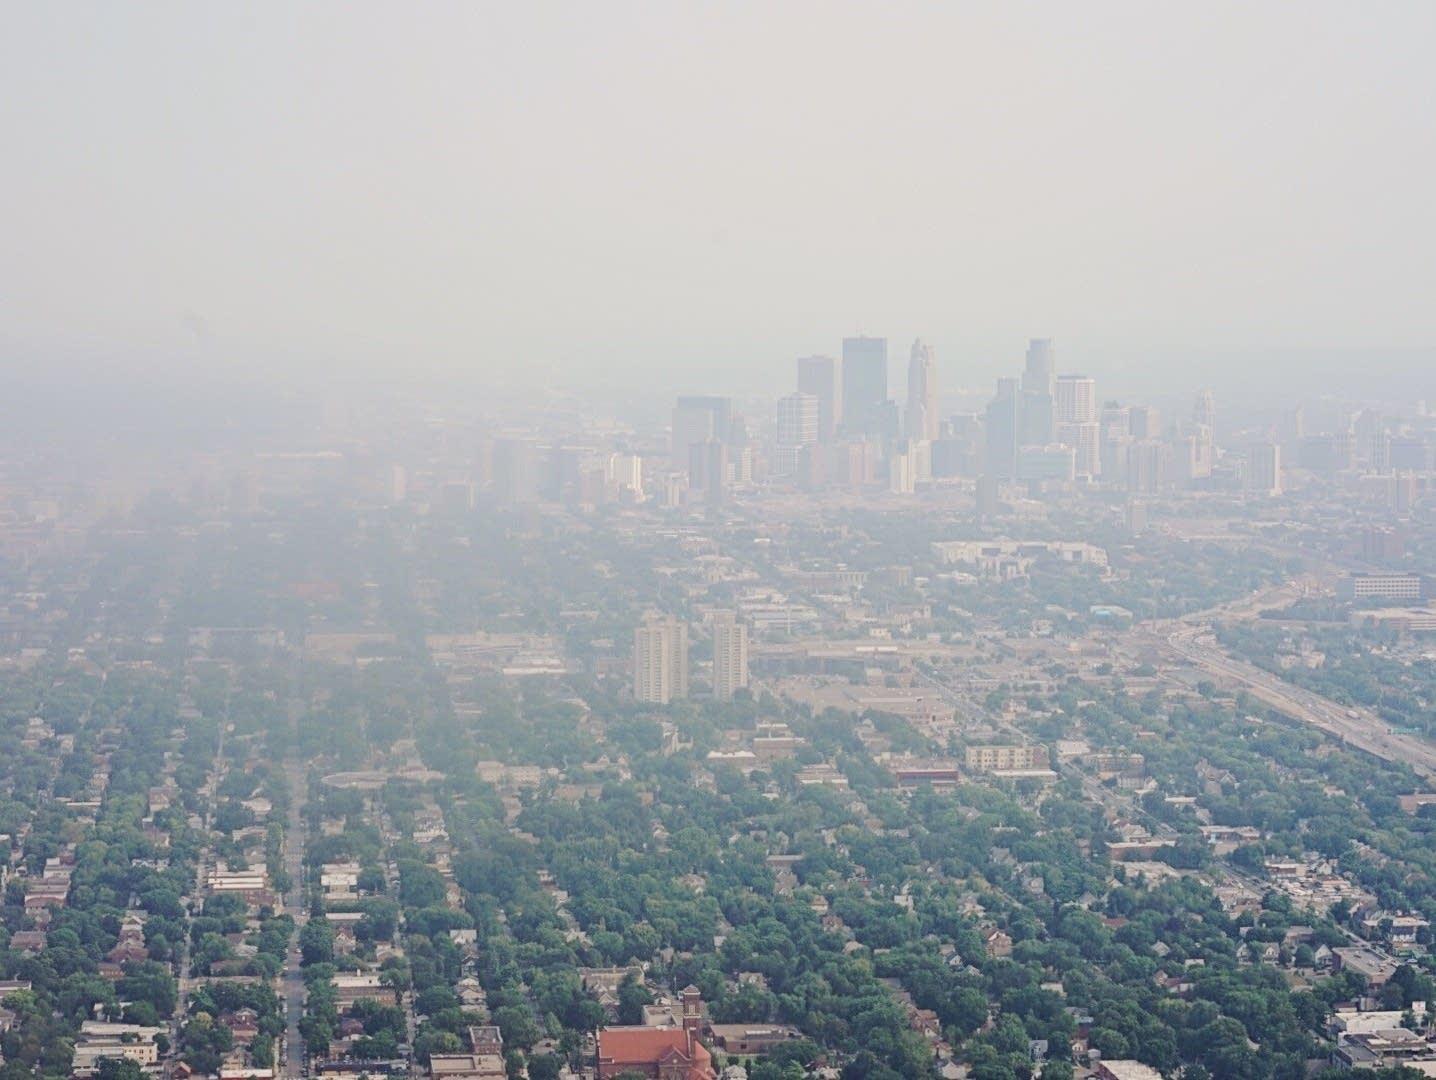 Smoky skies in Minnesota